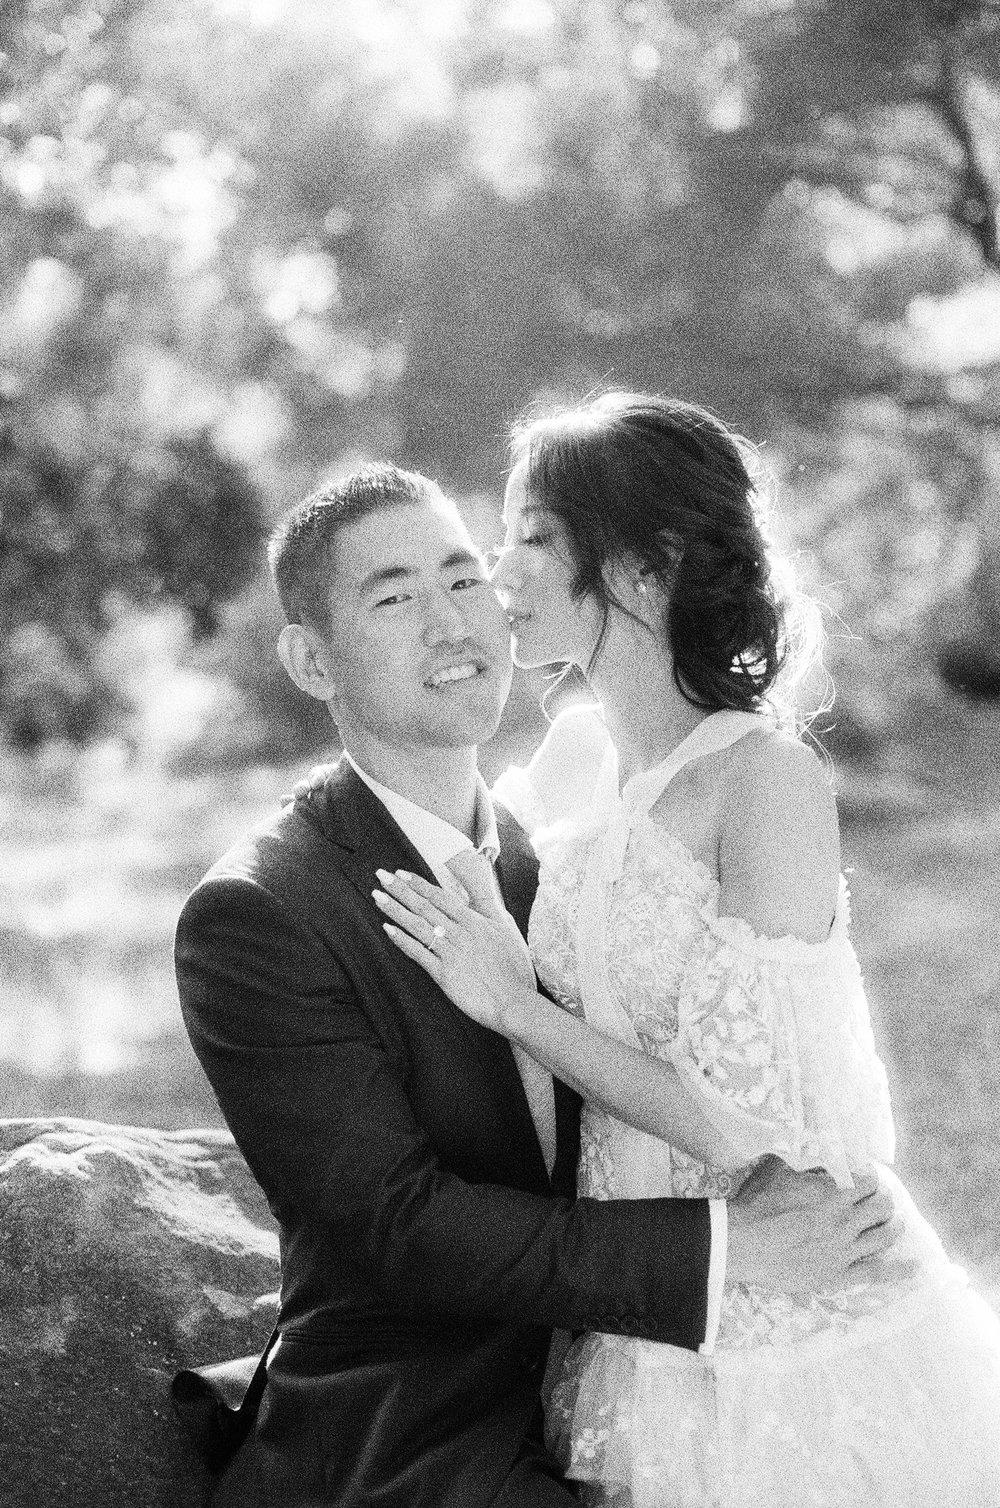 AR-Engagement-68-Jen-Huang-000005770026.jpg